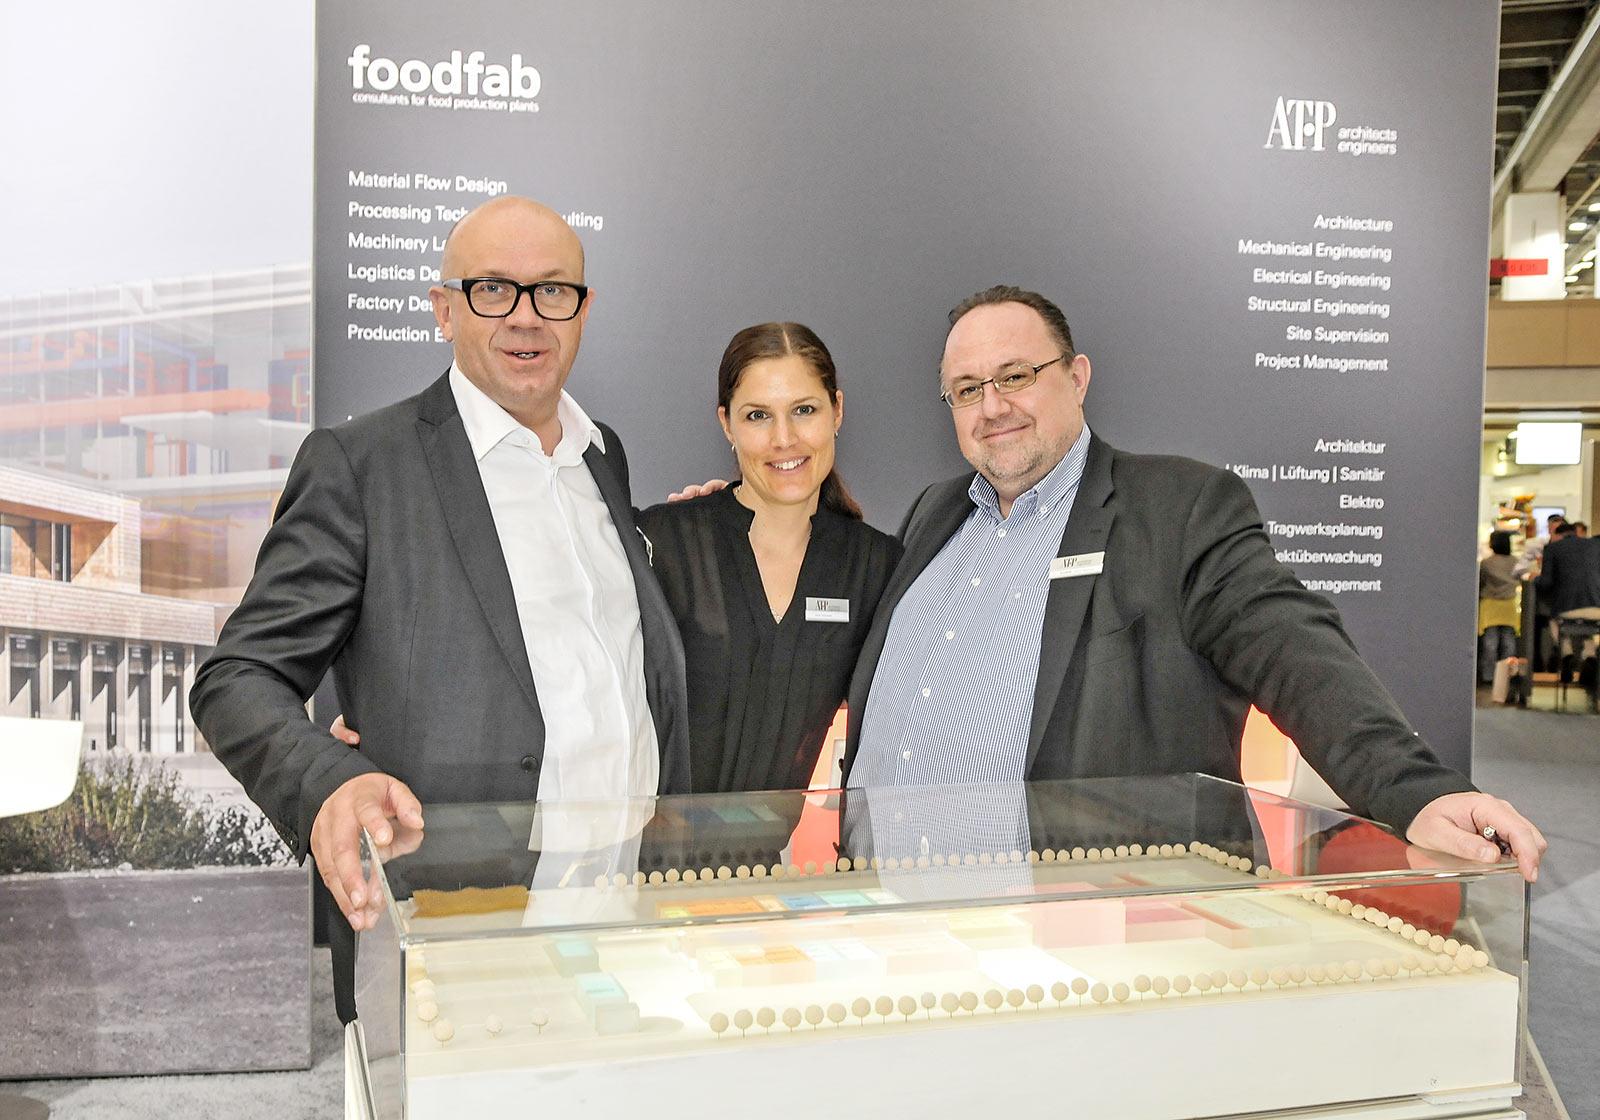 Michael Trautwein, Beate Fankhauser and Martin Katzlinger. Foto: Creativ Photo